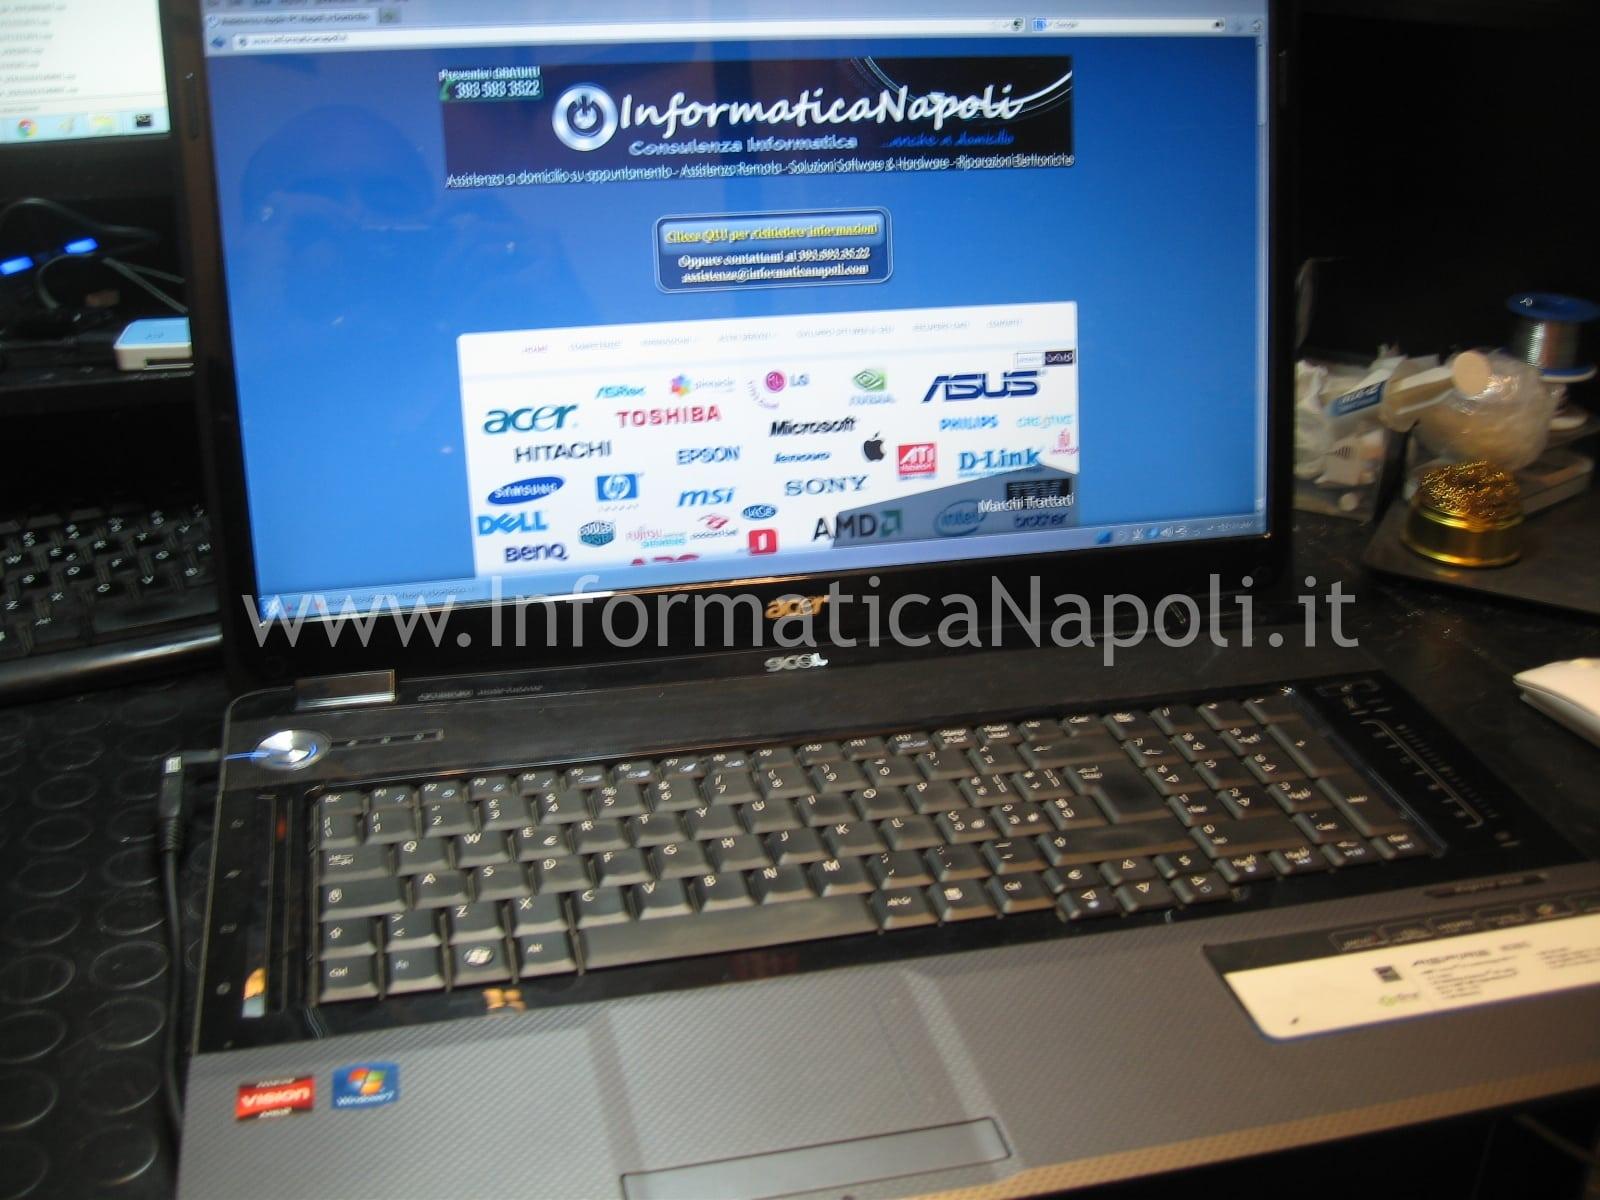 assistenza Acer aspire 8530 8530g MS2249 napoli